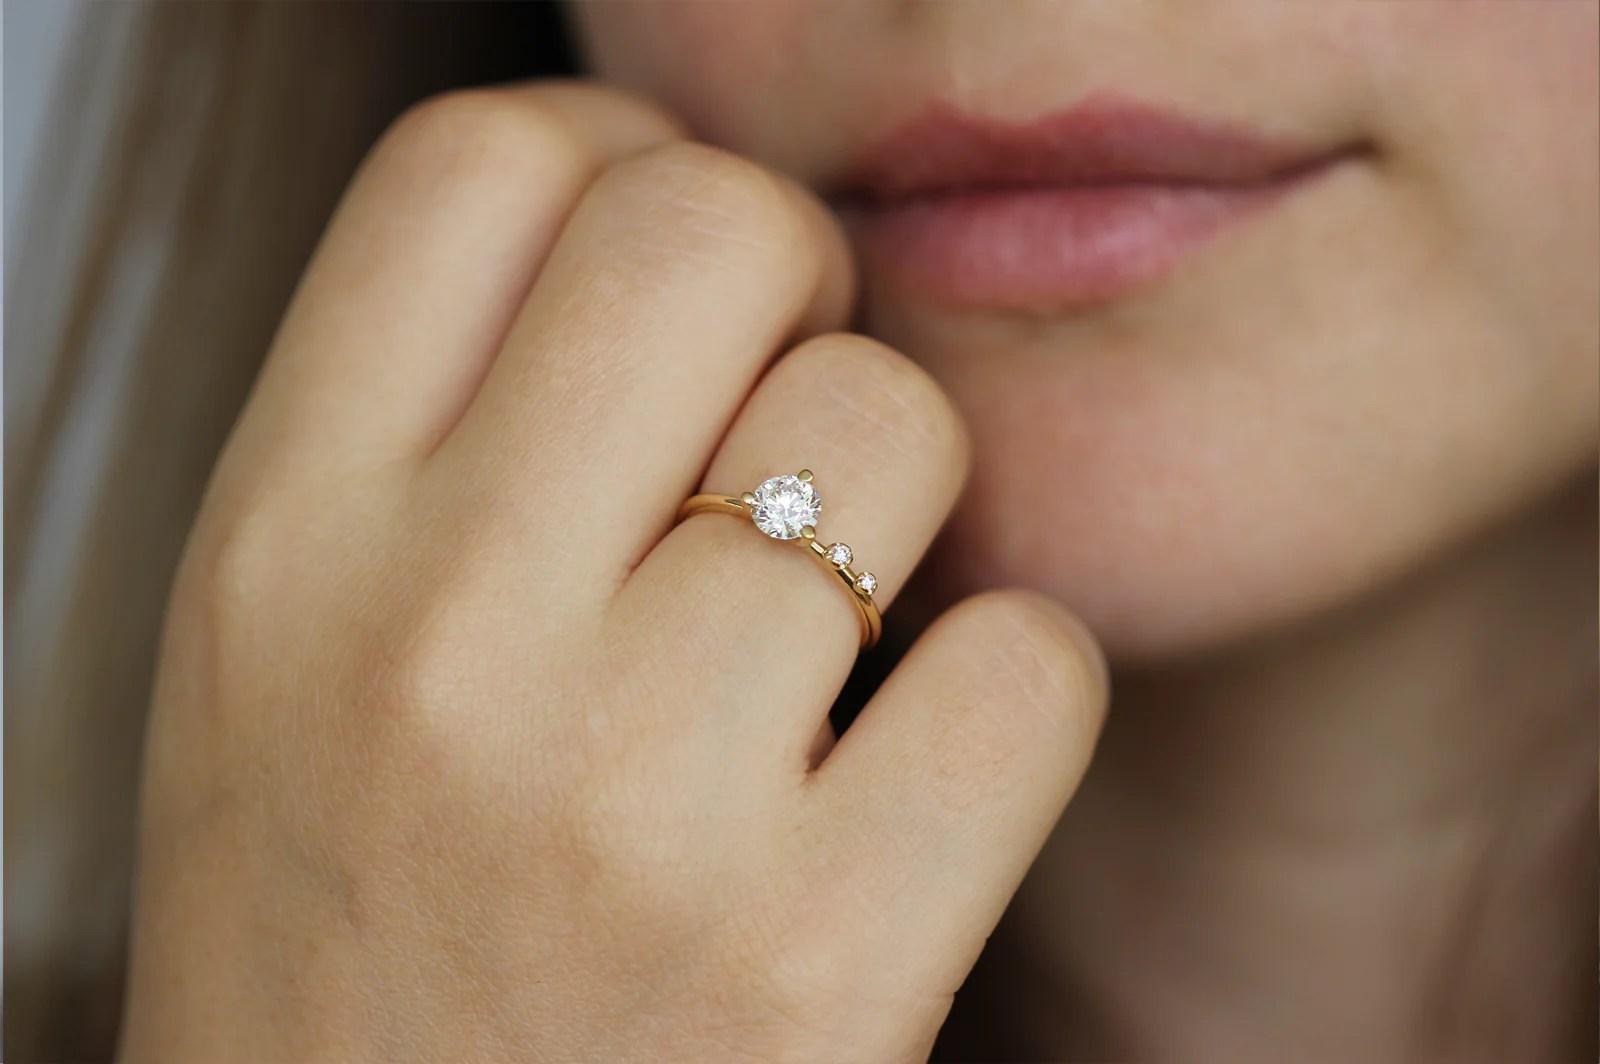 Asymmetrical Engagement Ring  075 Carat Round Diamond